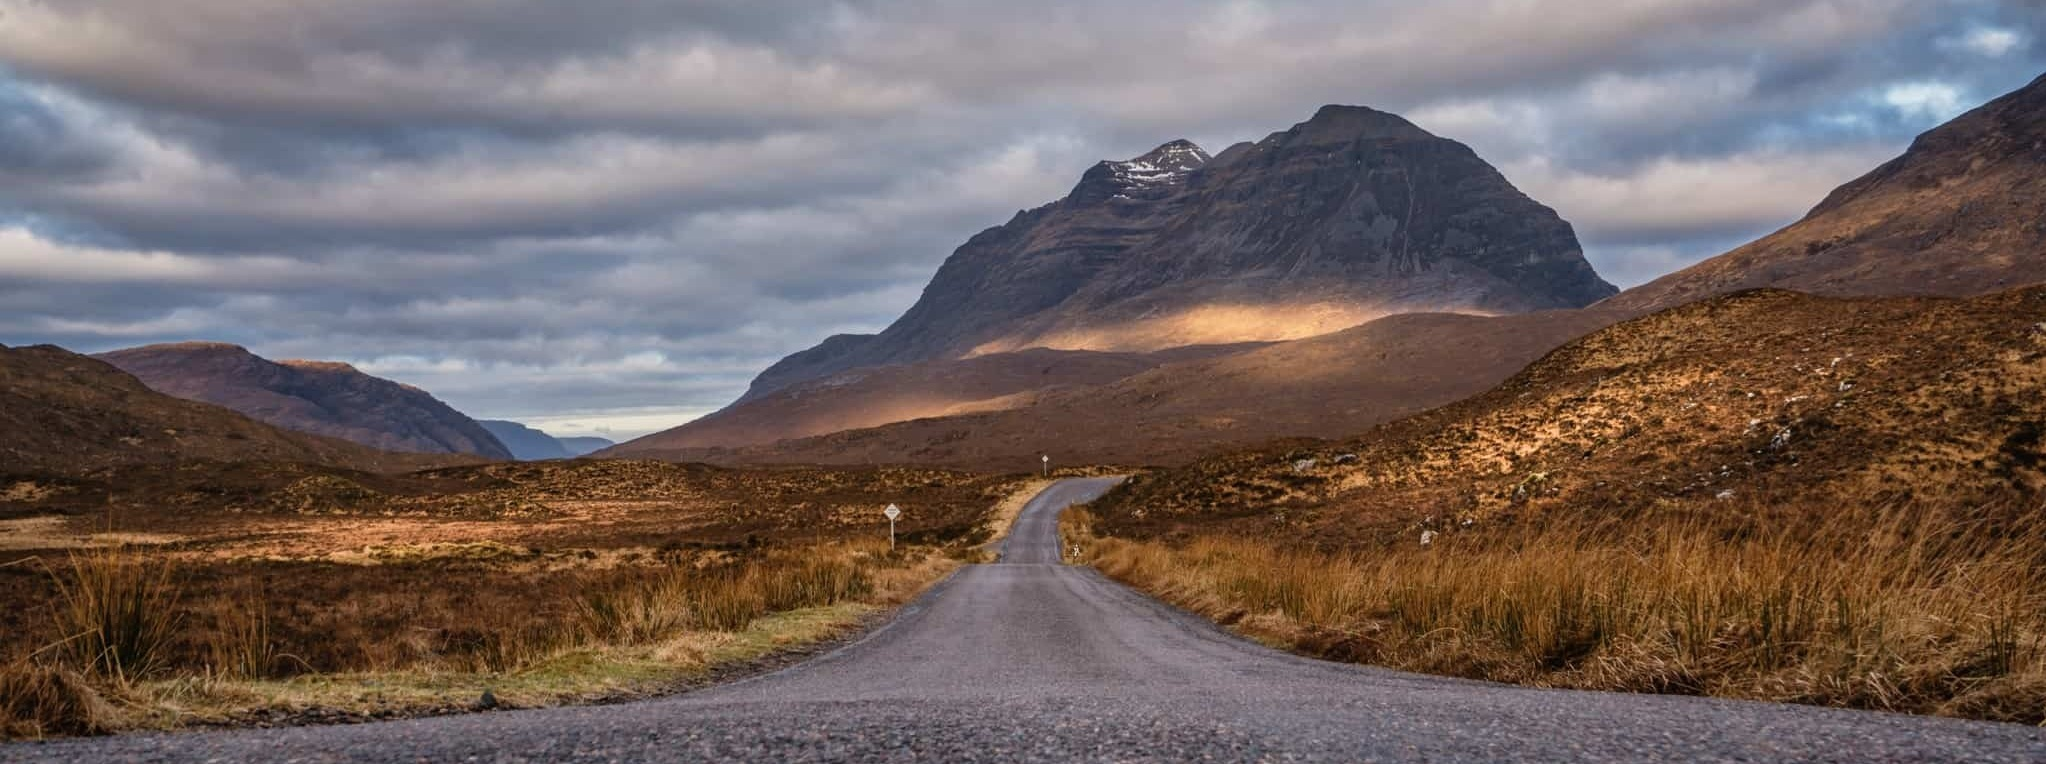 north-coast-500-guide-scotland.jpg